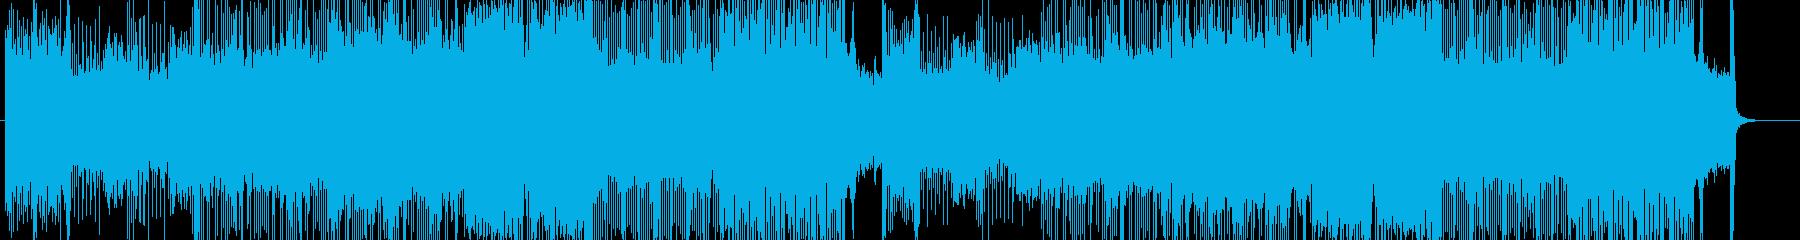 「HR/HM」「DARK」BGM88の再生済みの波形